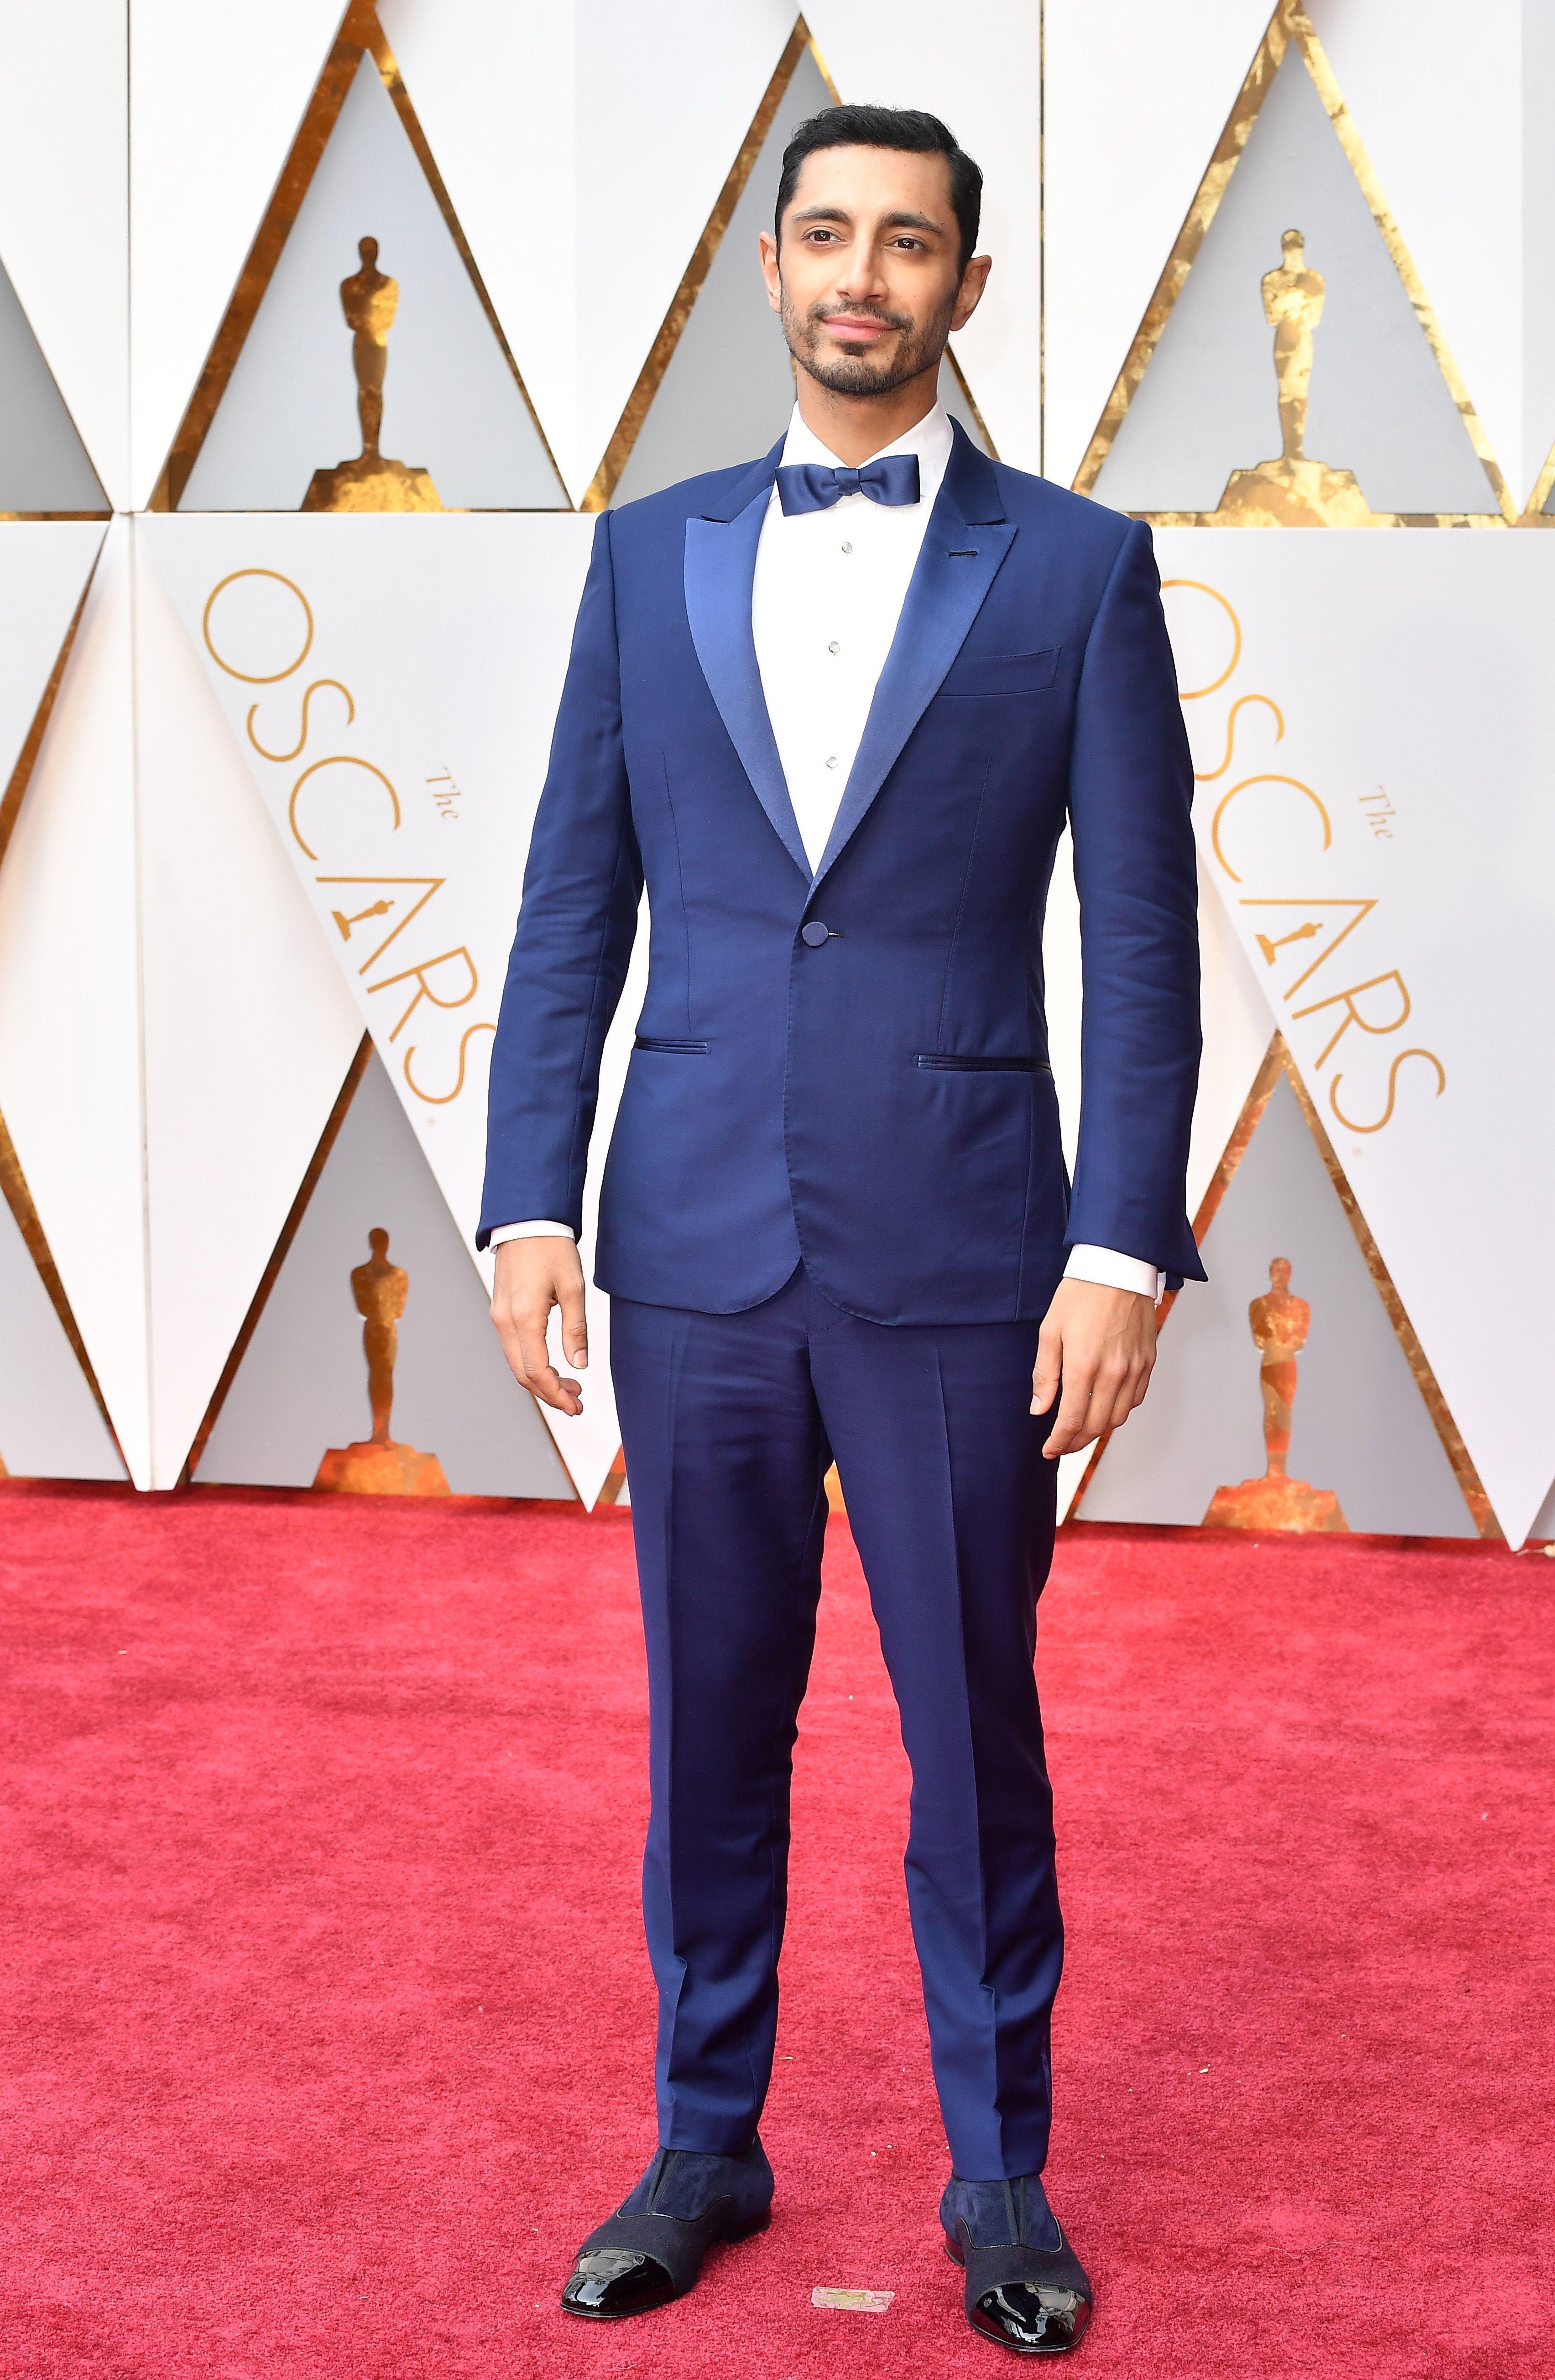 Oscars 2017: The Best Dressed Men   Royal blue suit